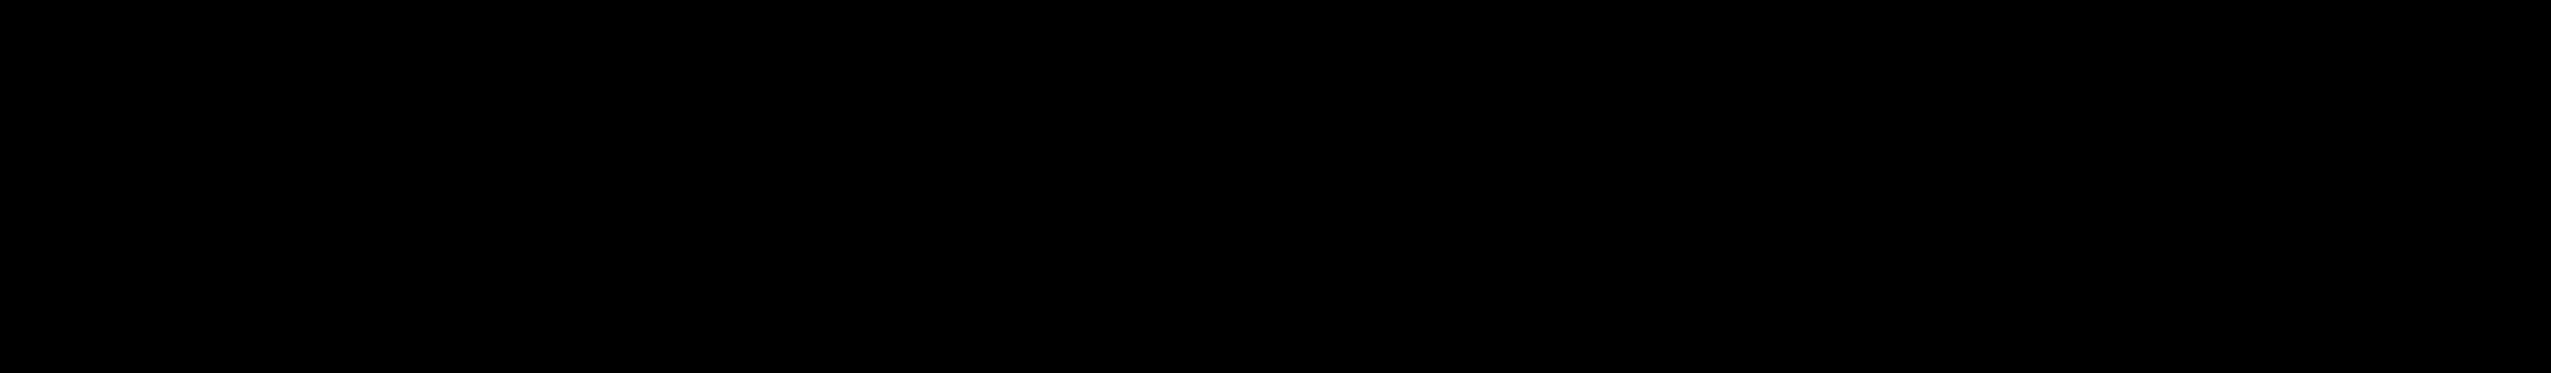 sikafootwear_logo_NEG_A.png